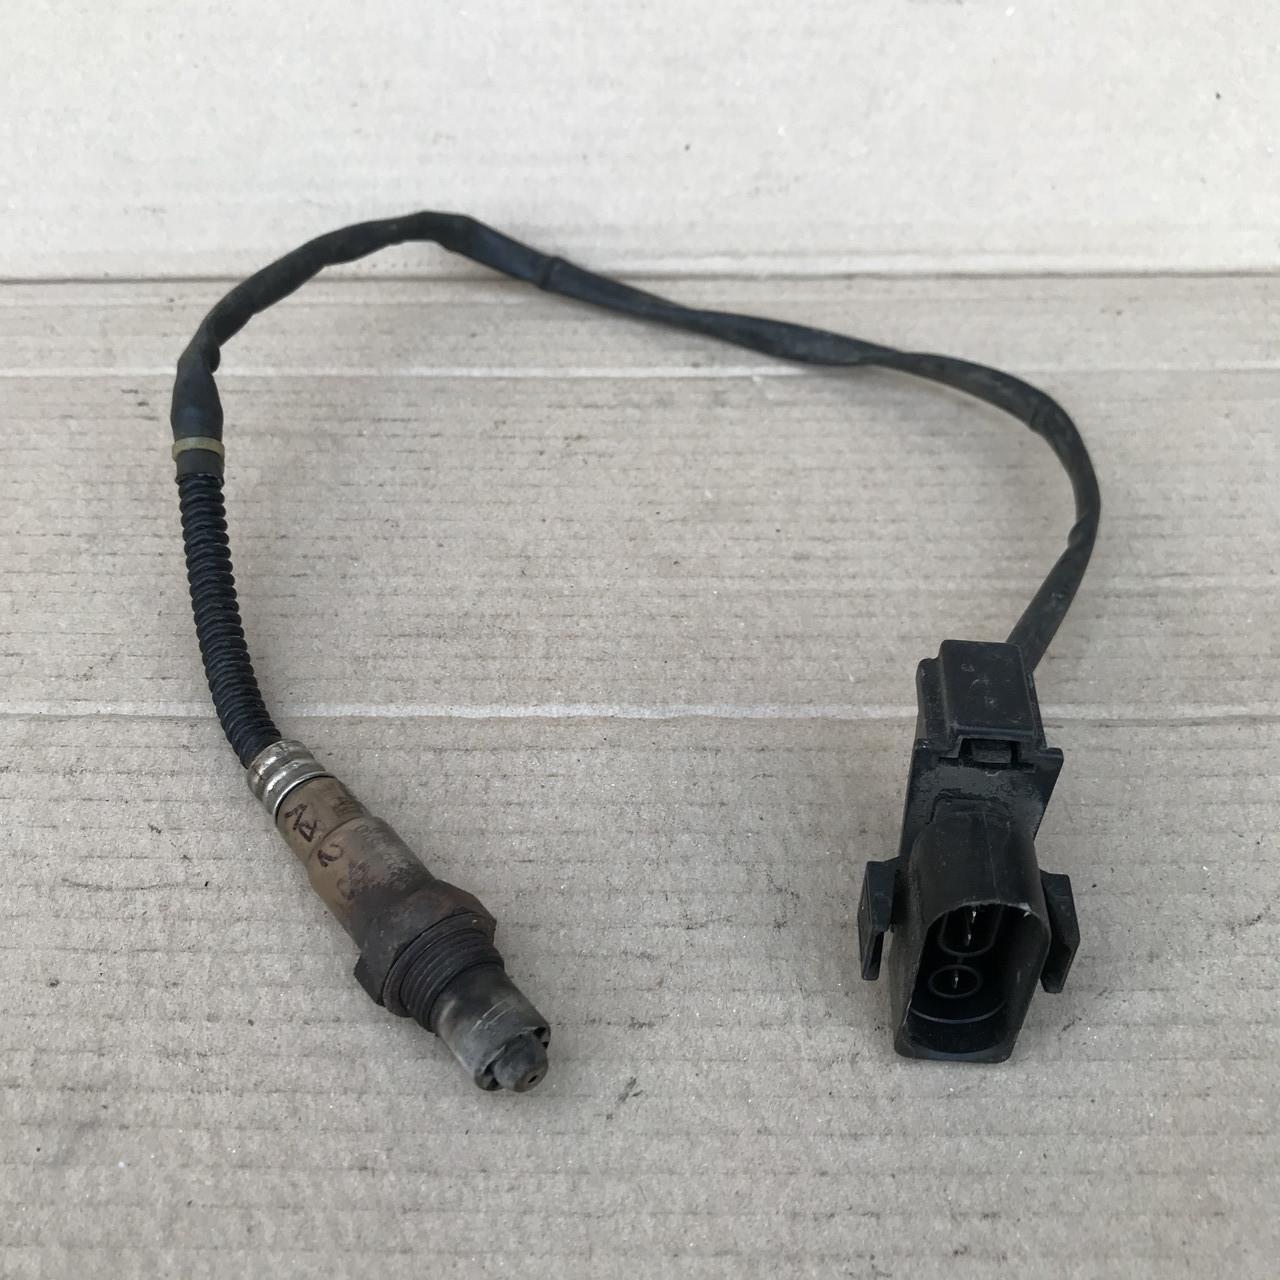 078906265M Лямда-Зонд на Audi / VW 2.8 бензин 0258006287/288